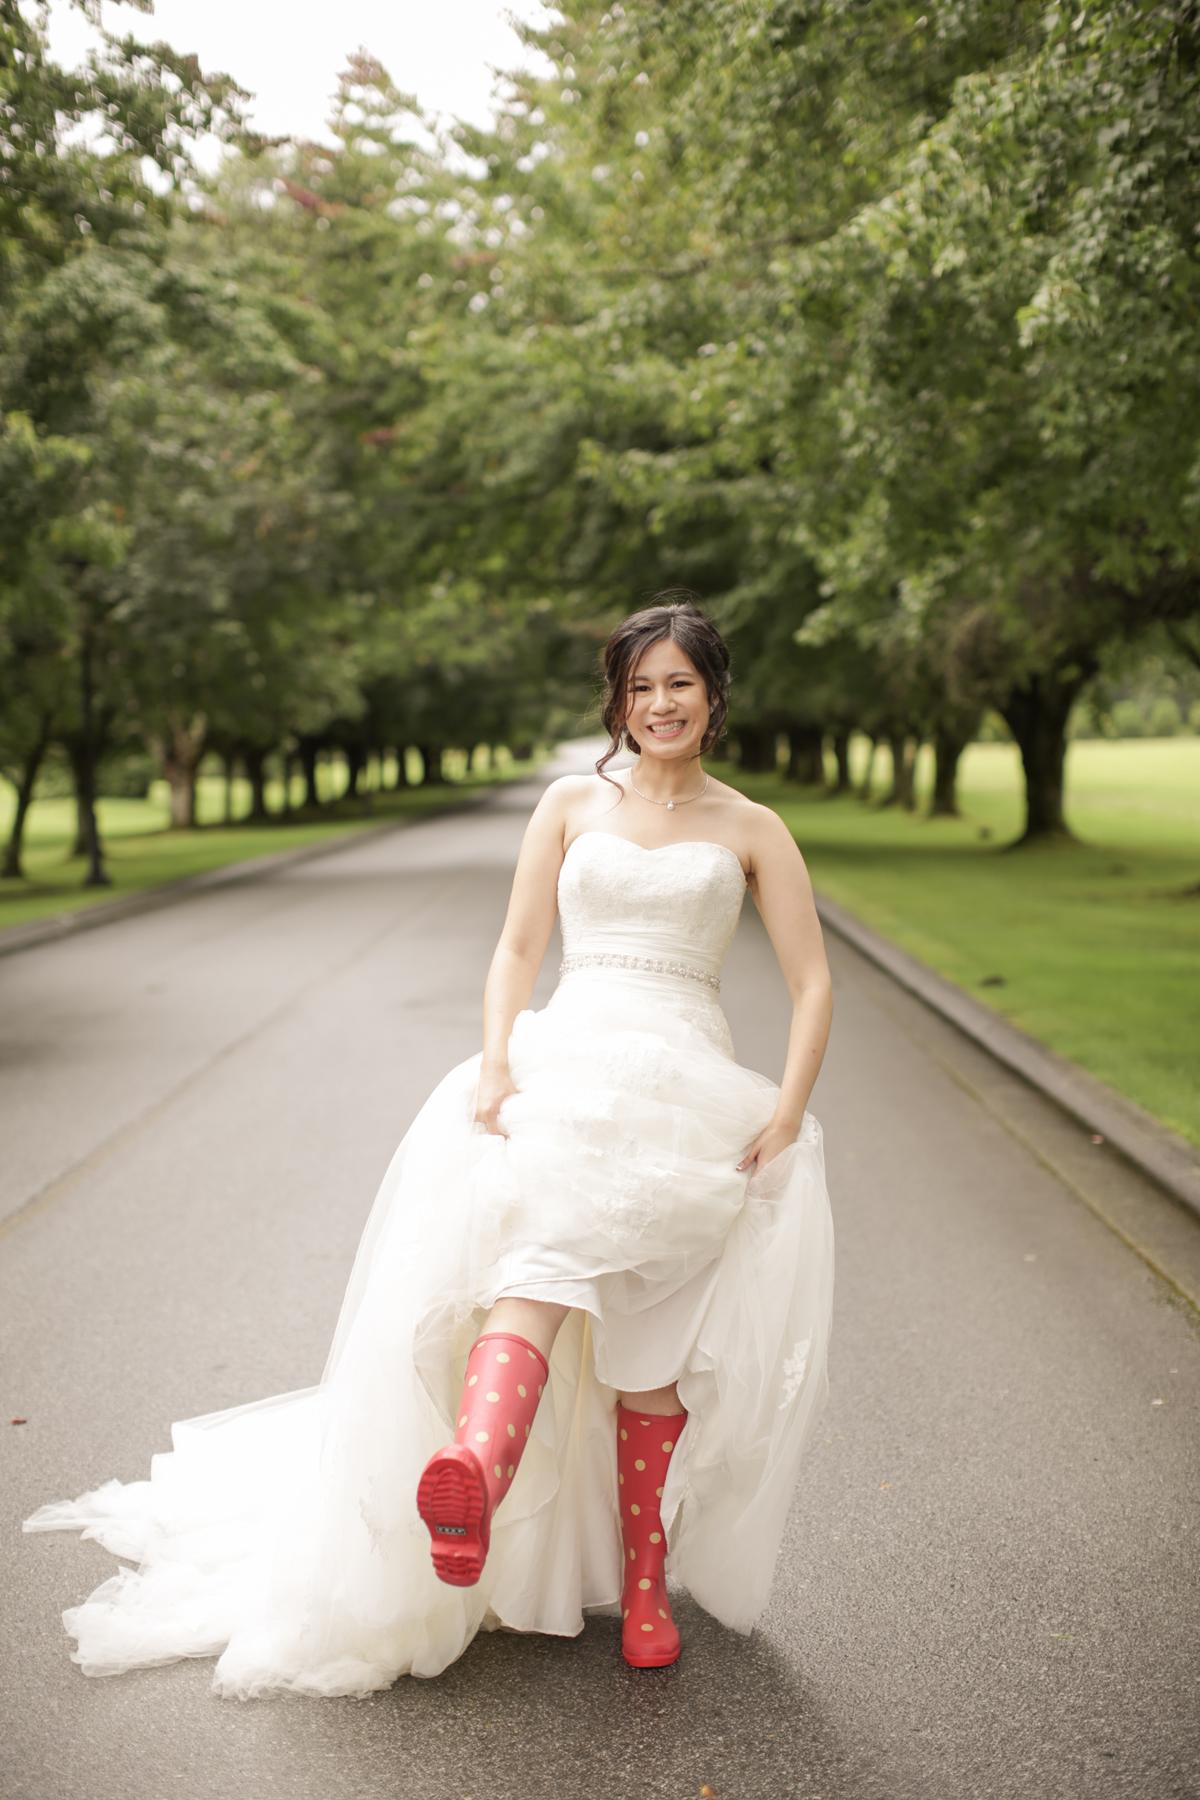 wedding-tips-from-a-wedding-photographer-wear-rain-boots